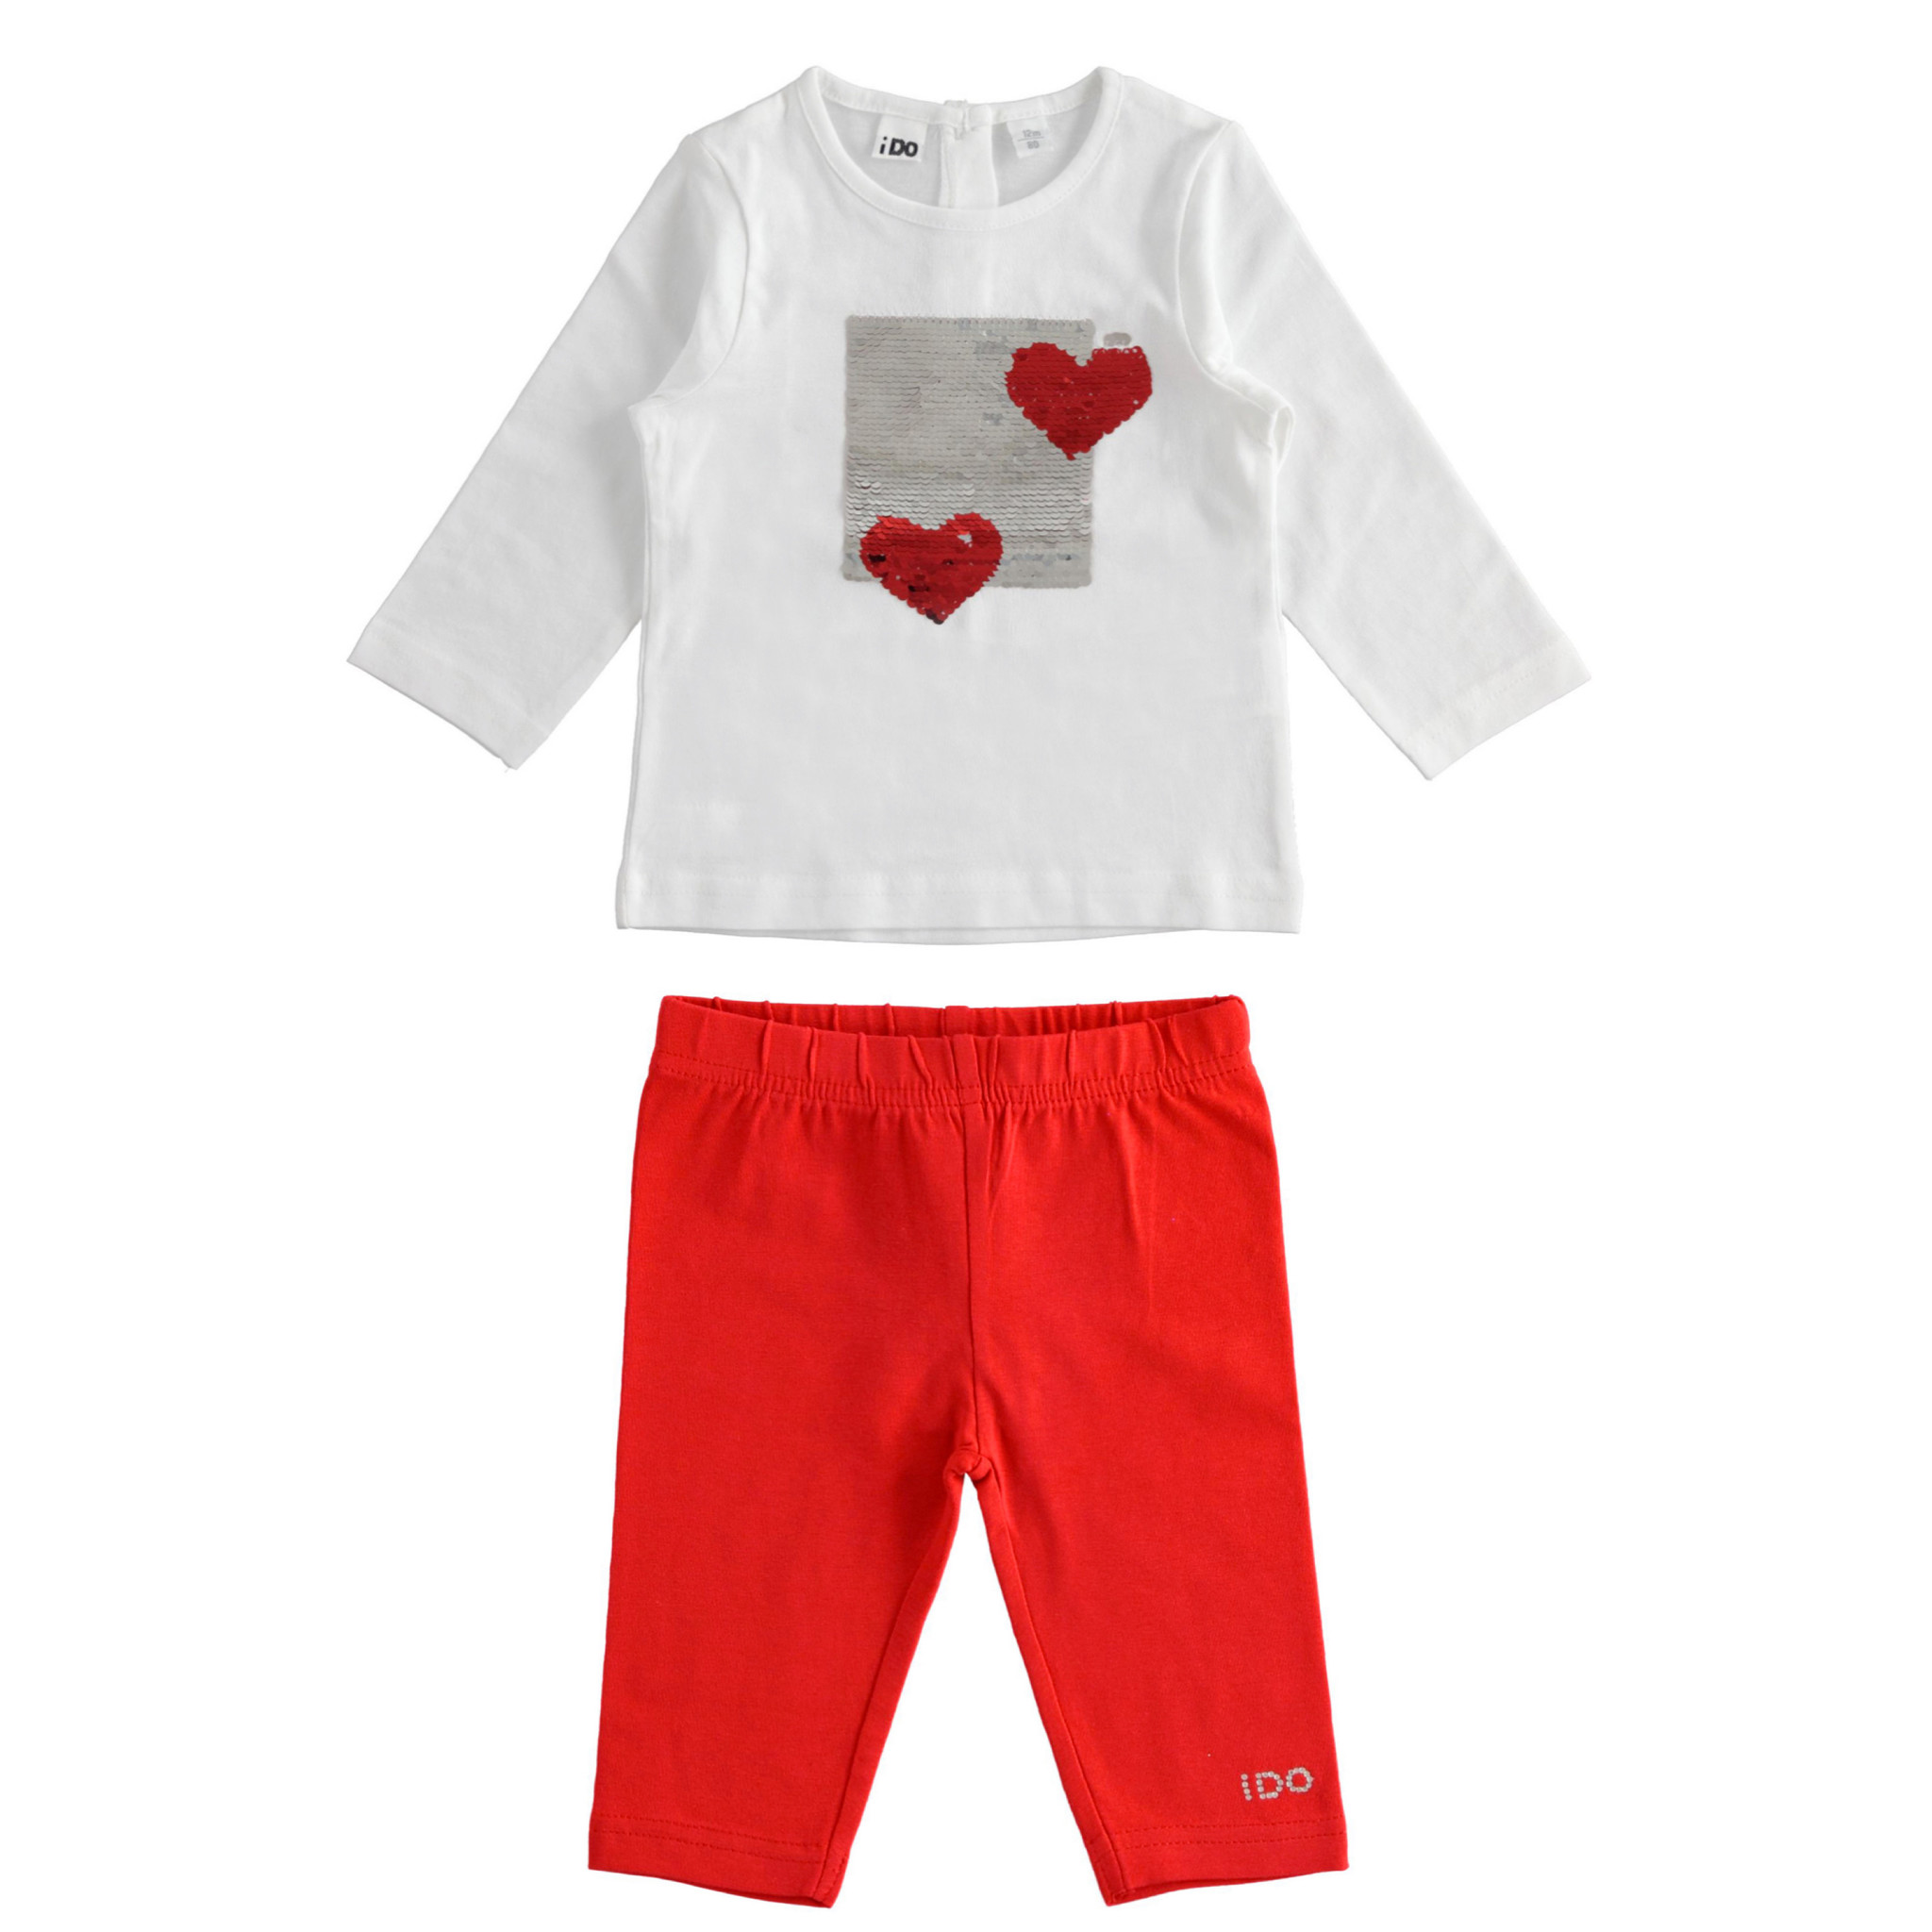 Ido IDO Reversible Sequin Love Heart Legging Set S21